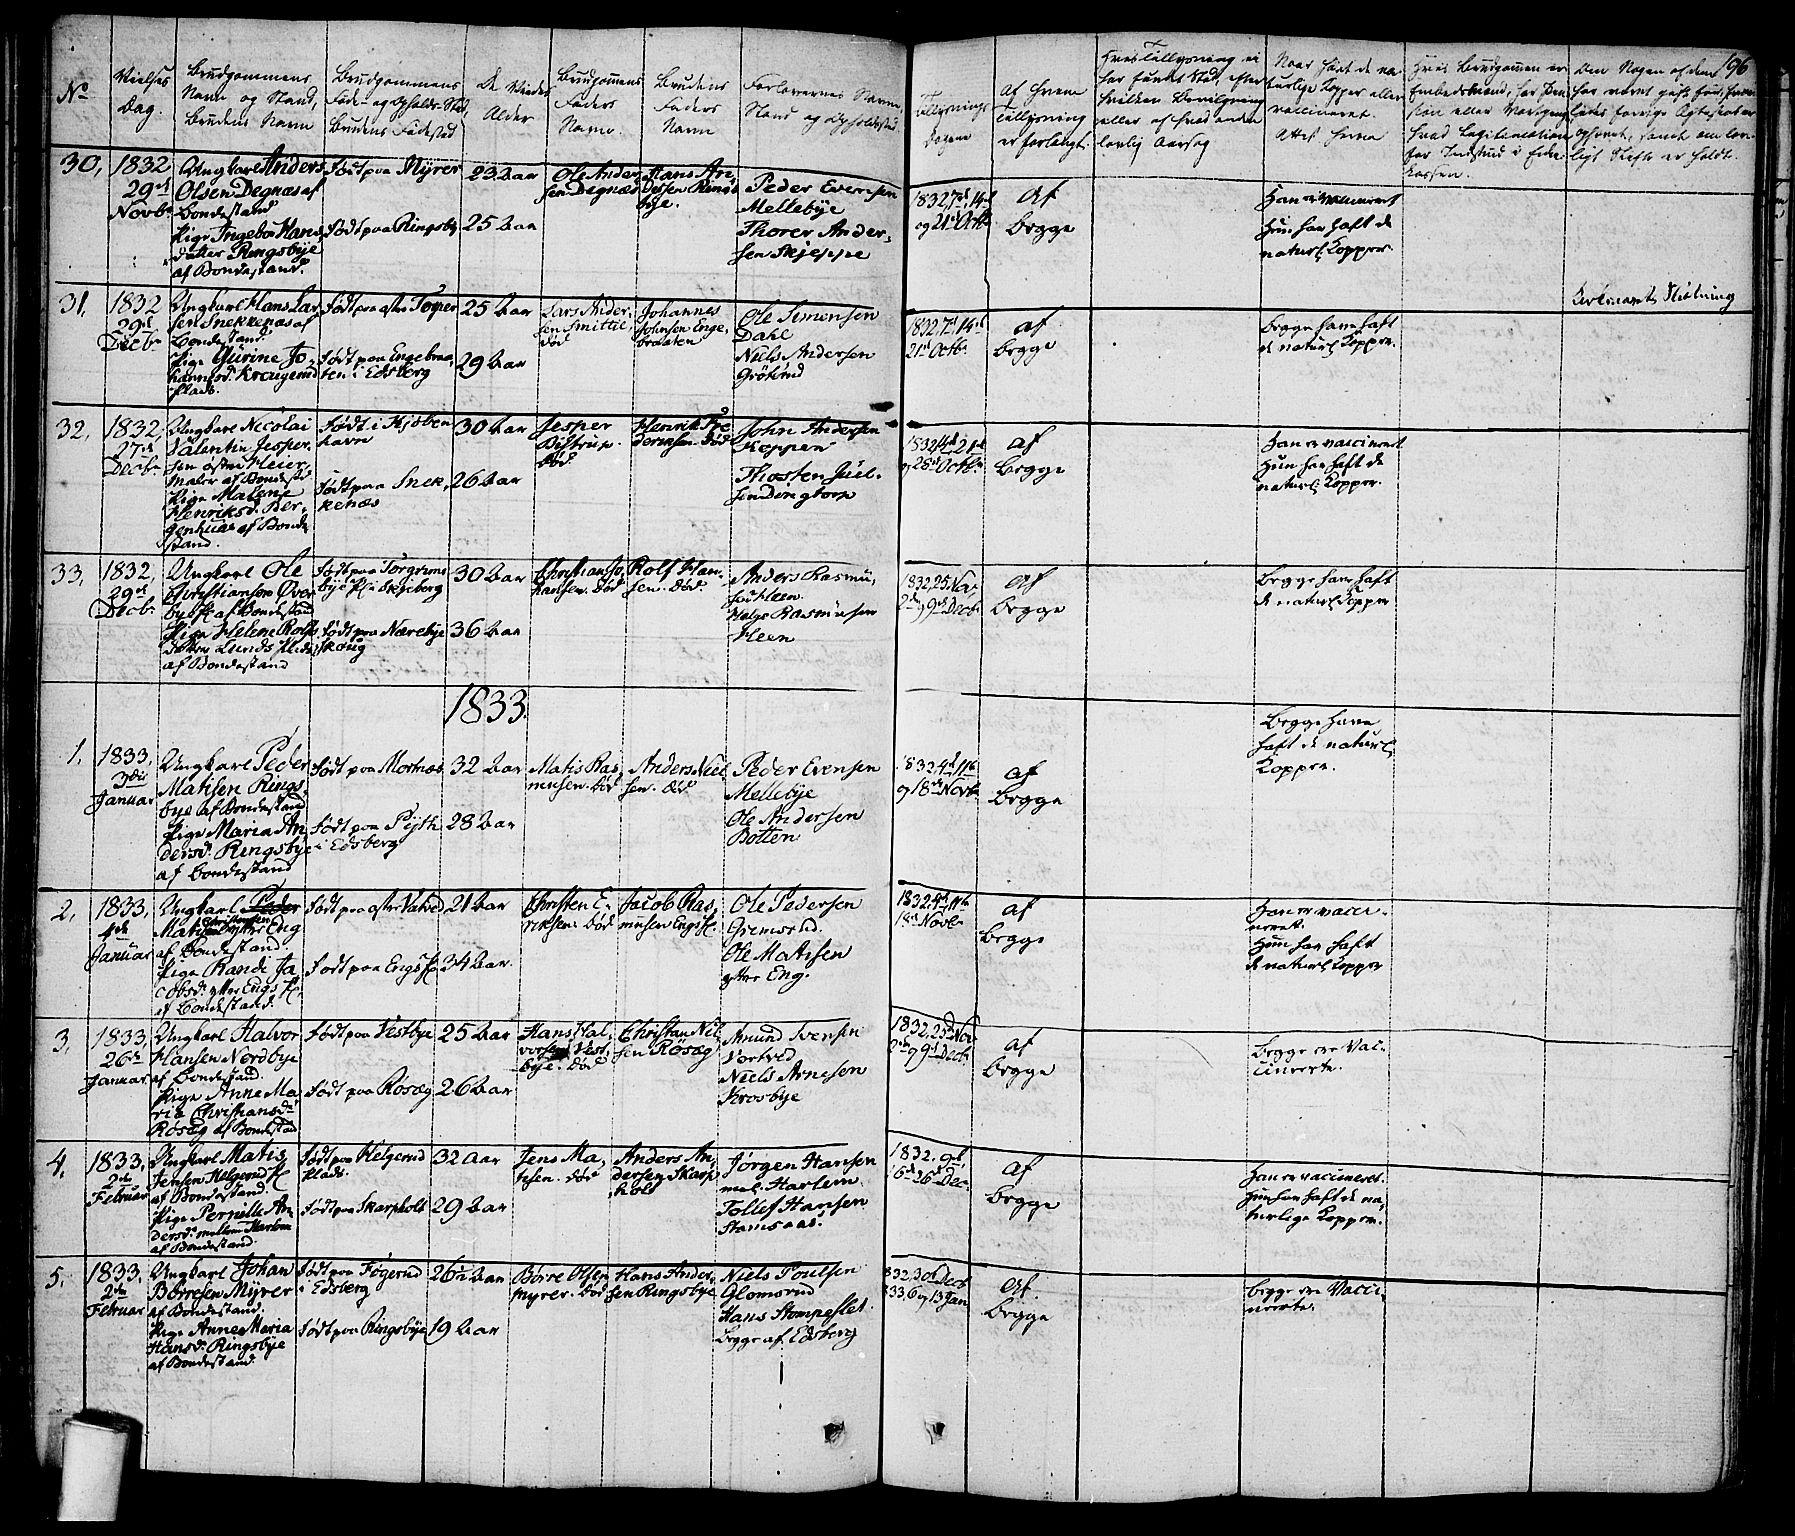 SAO, Rakkestad prestekontor Kirkebøker, F/Fa/L0007: Ministerialbok nr. I 7, 1825-1841, s. 196